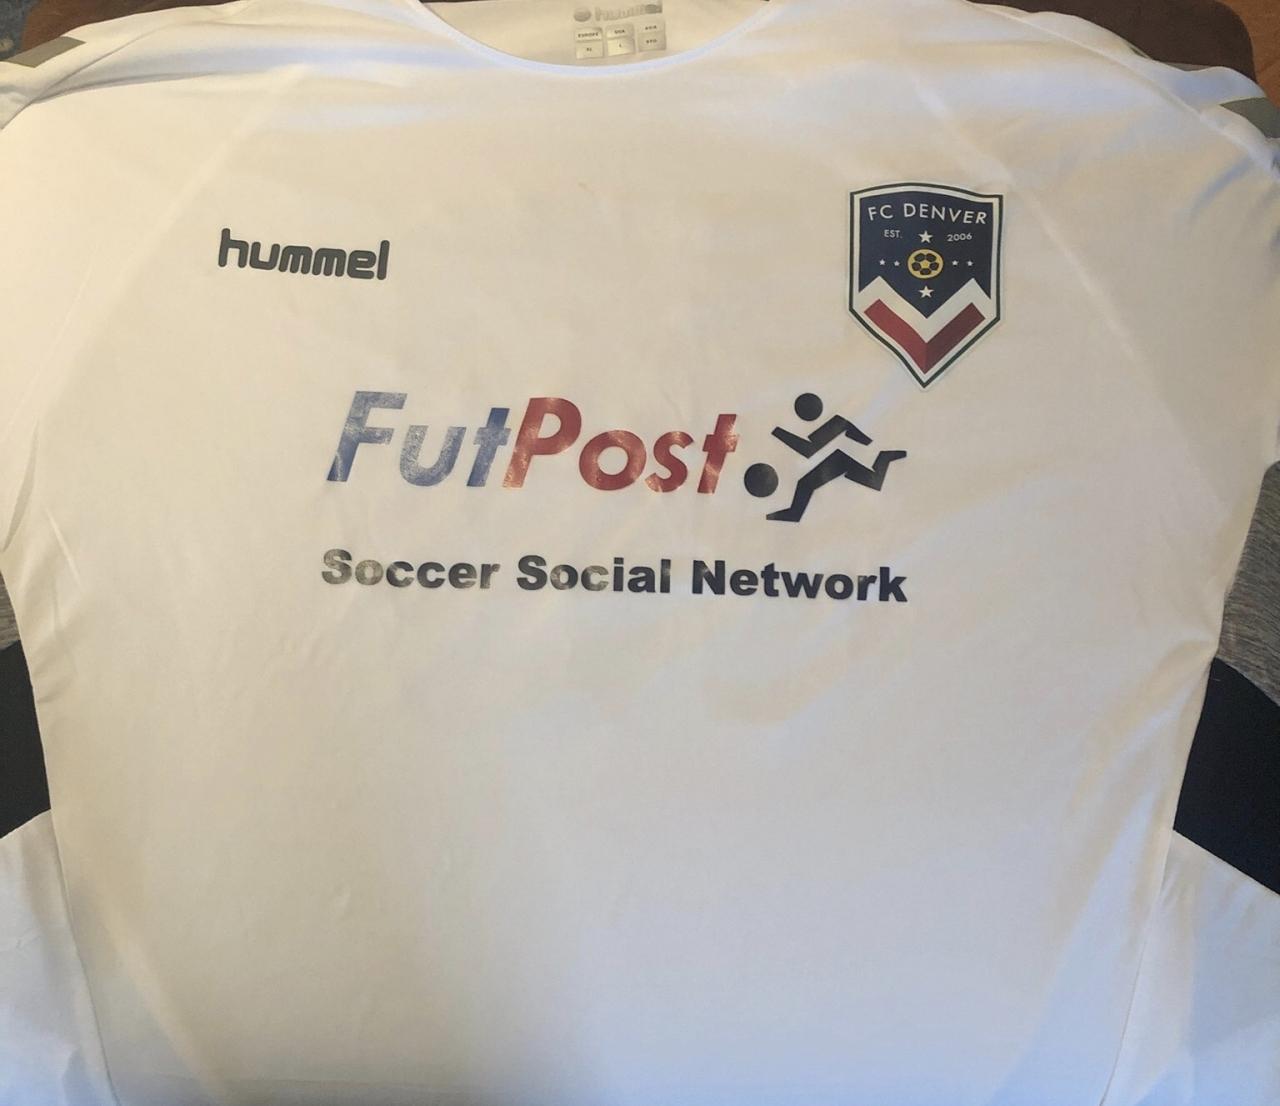 Futpost-2019 Kit-1